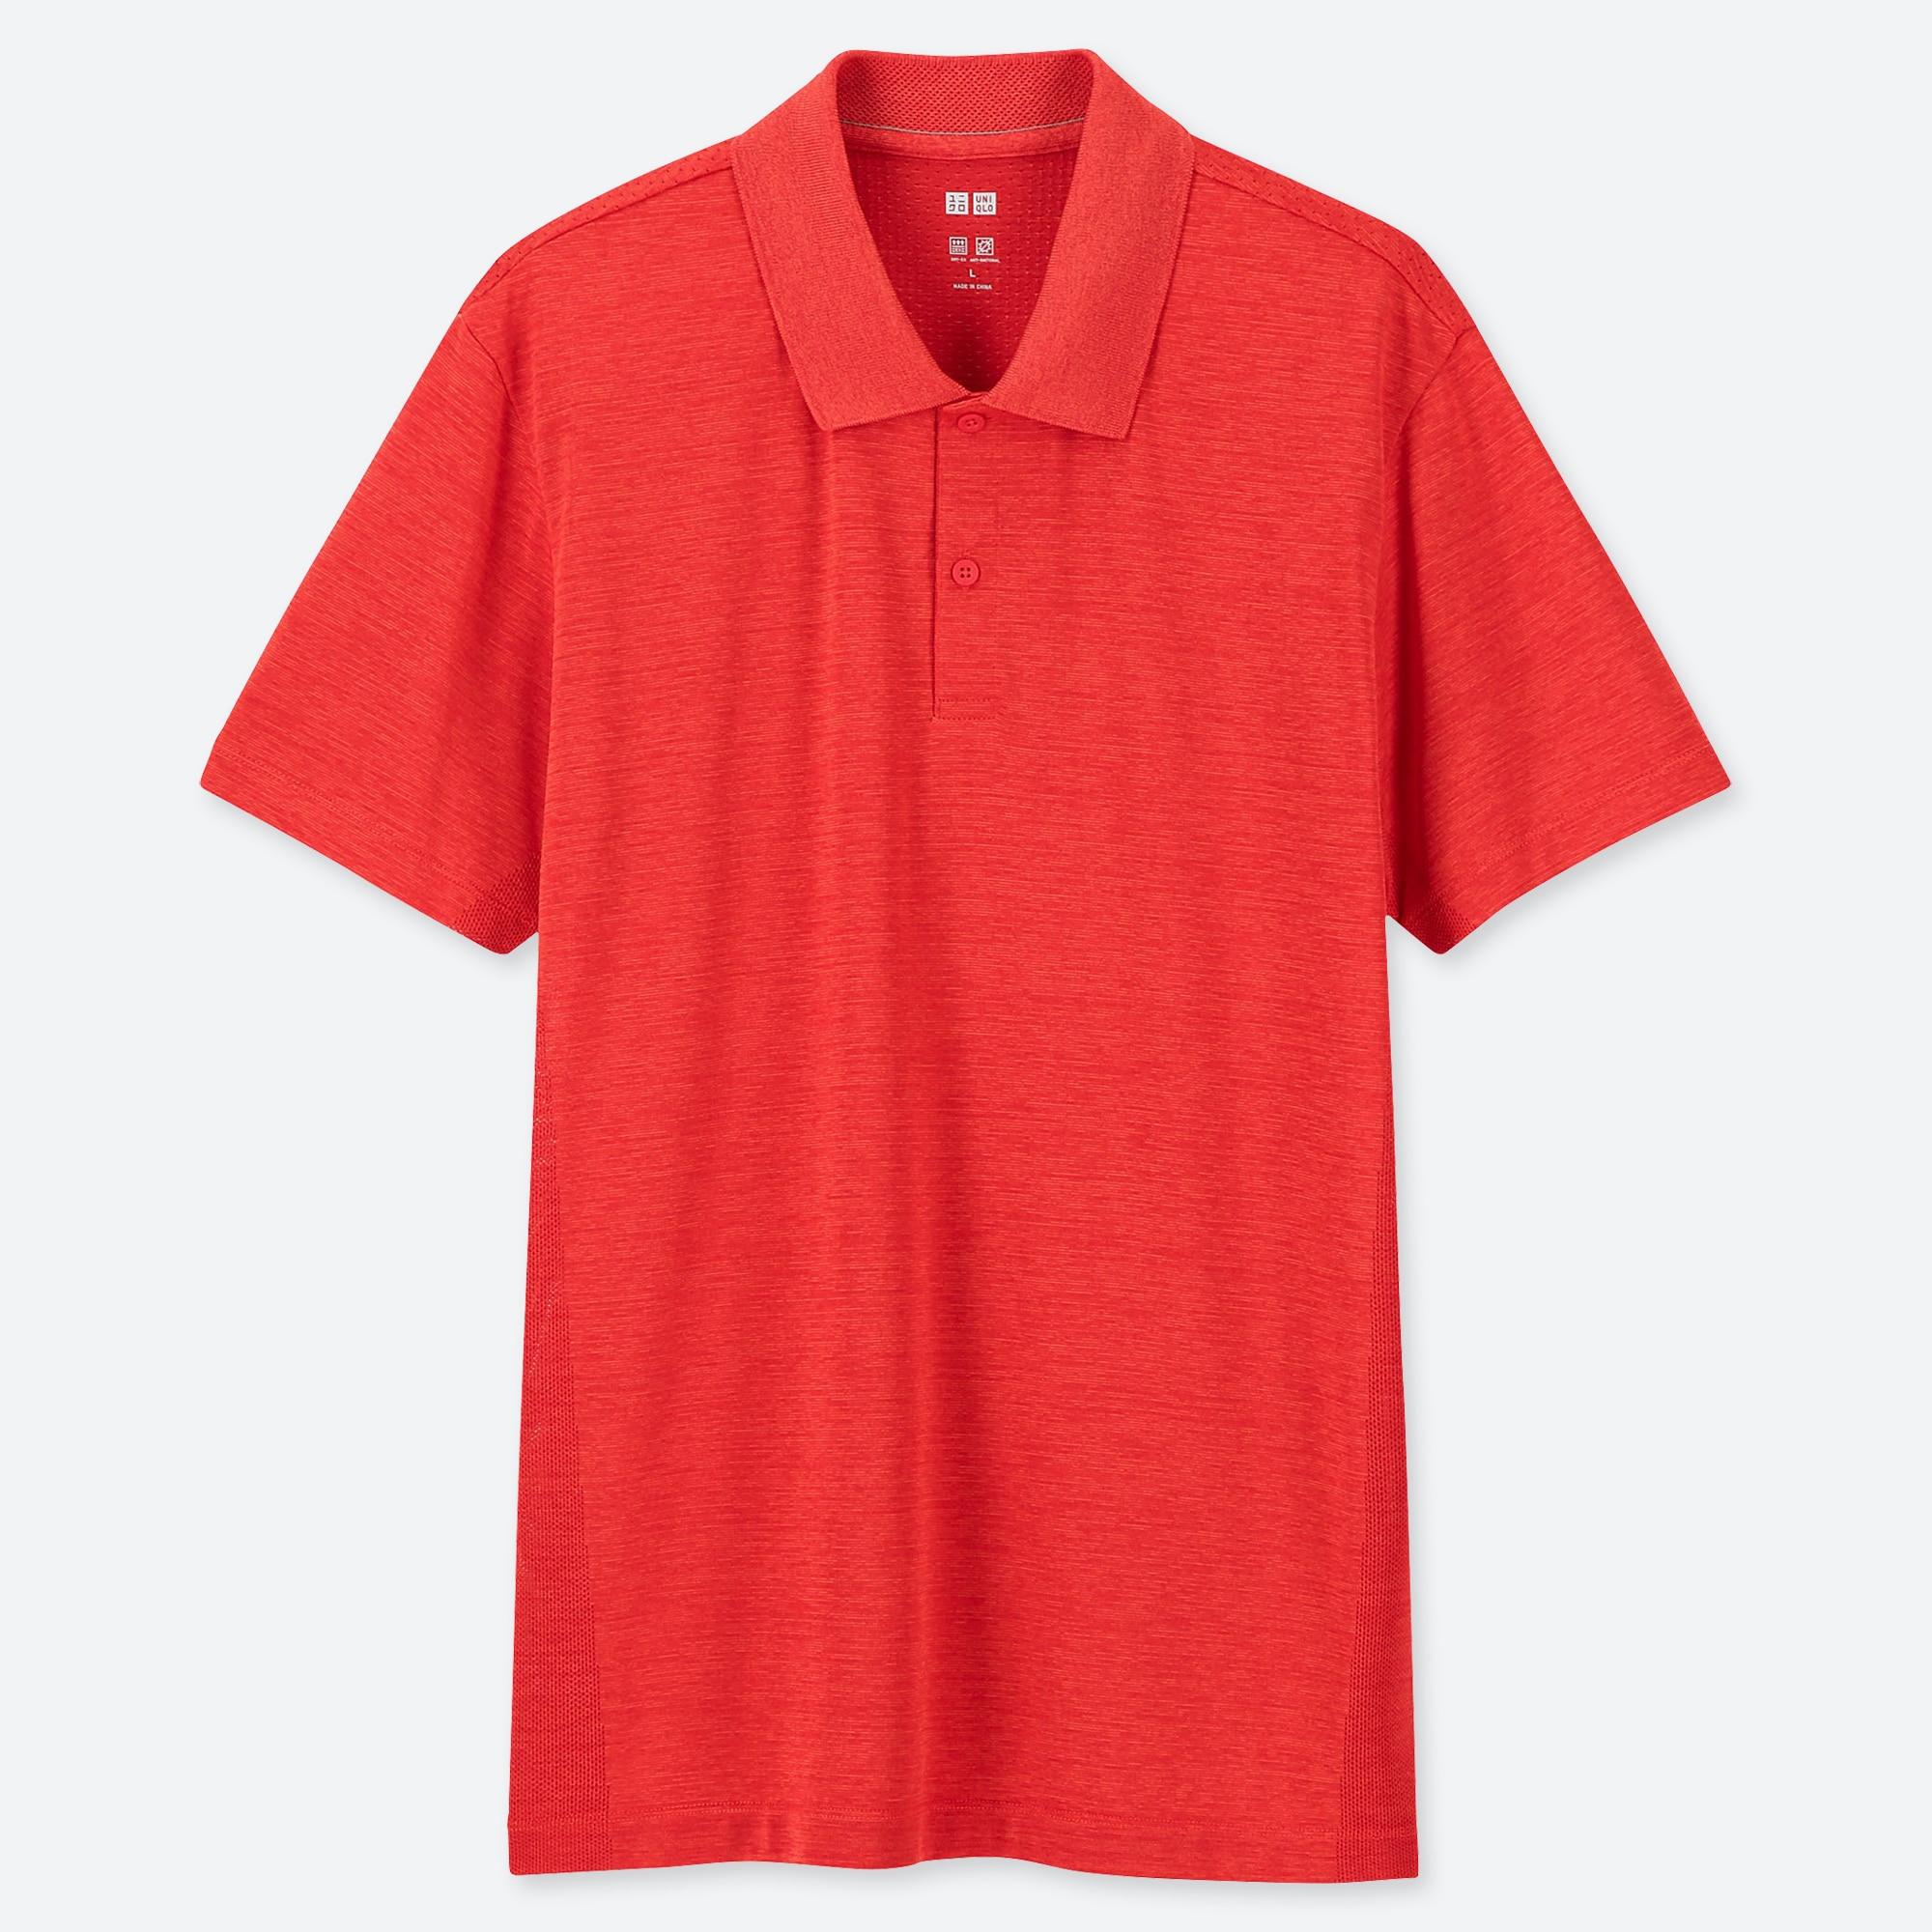 Cat Love Mens Short Sleeve Polo Shirt Regular Blouse Sportswear